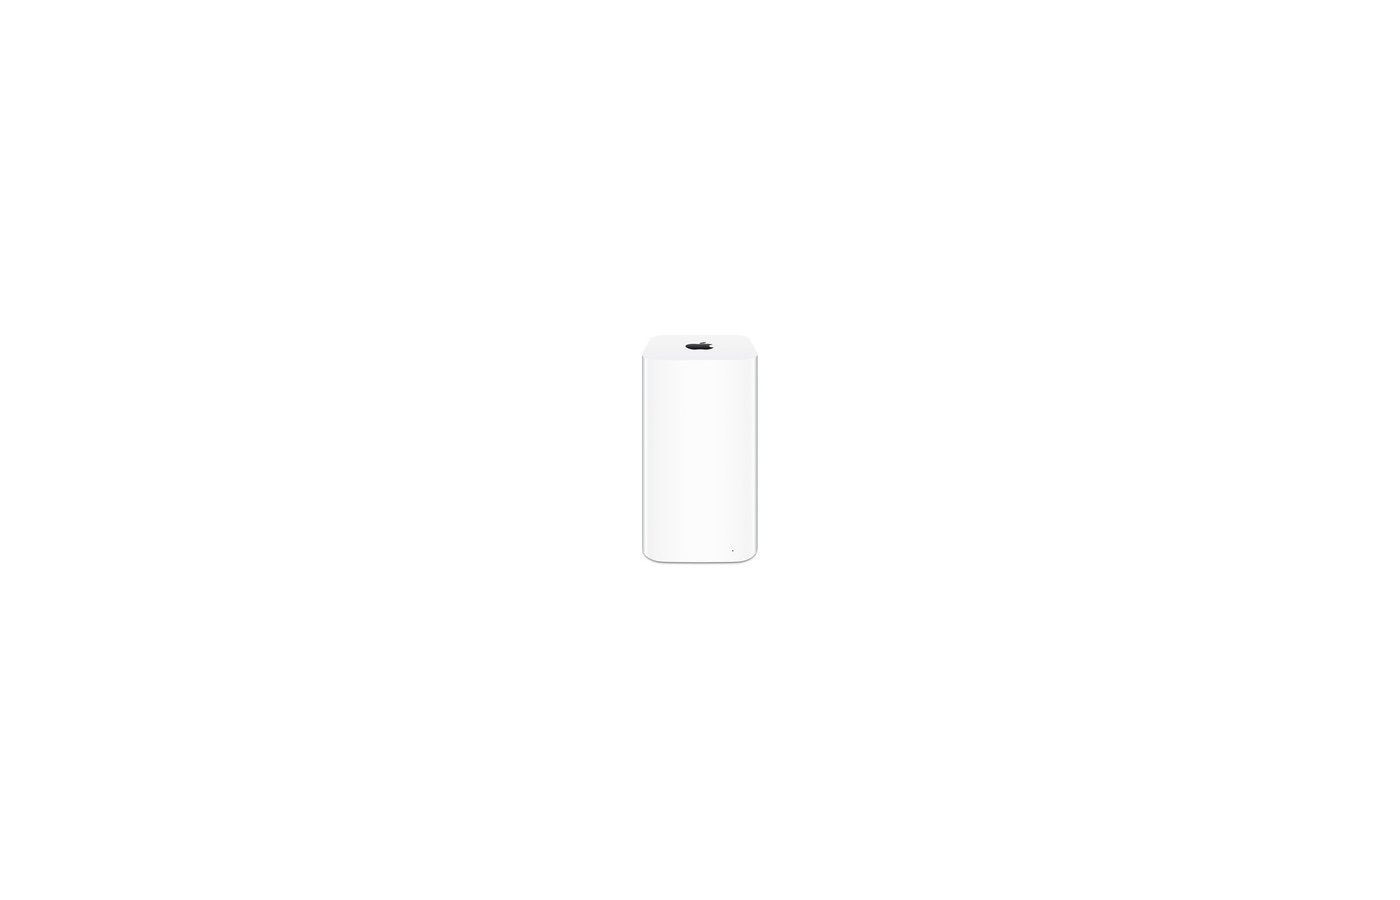 Сетевое оборудование Apple AirPort Time Capsule - 3TB